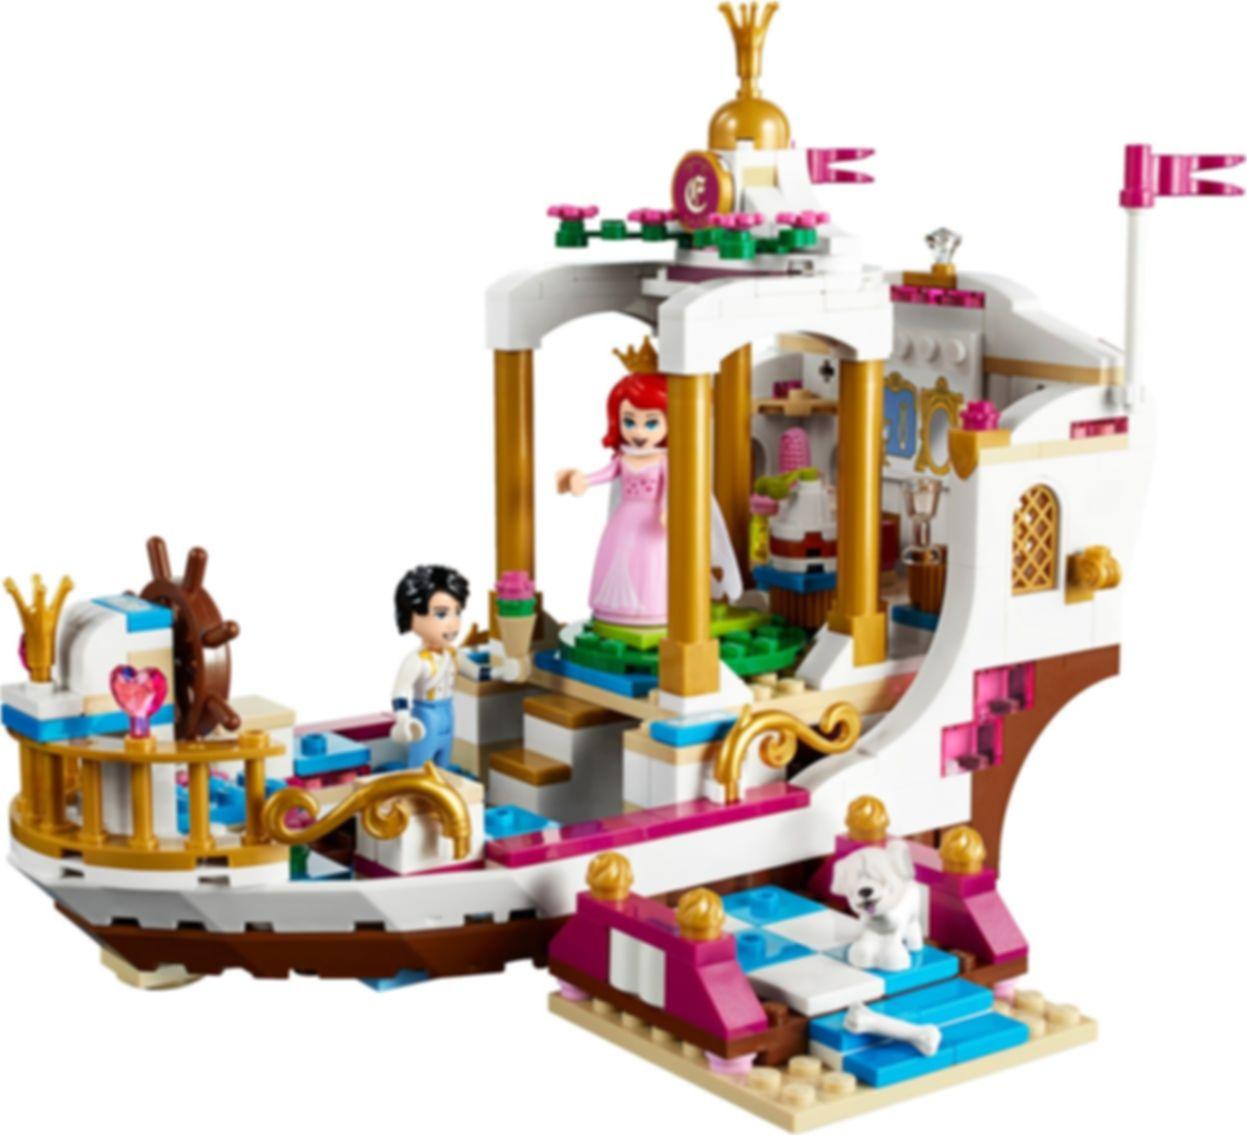 Ariel's Royal Celebration Boat gameplay